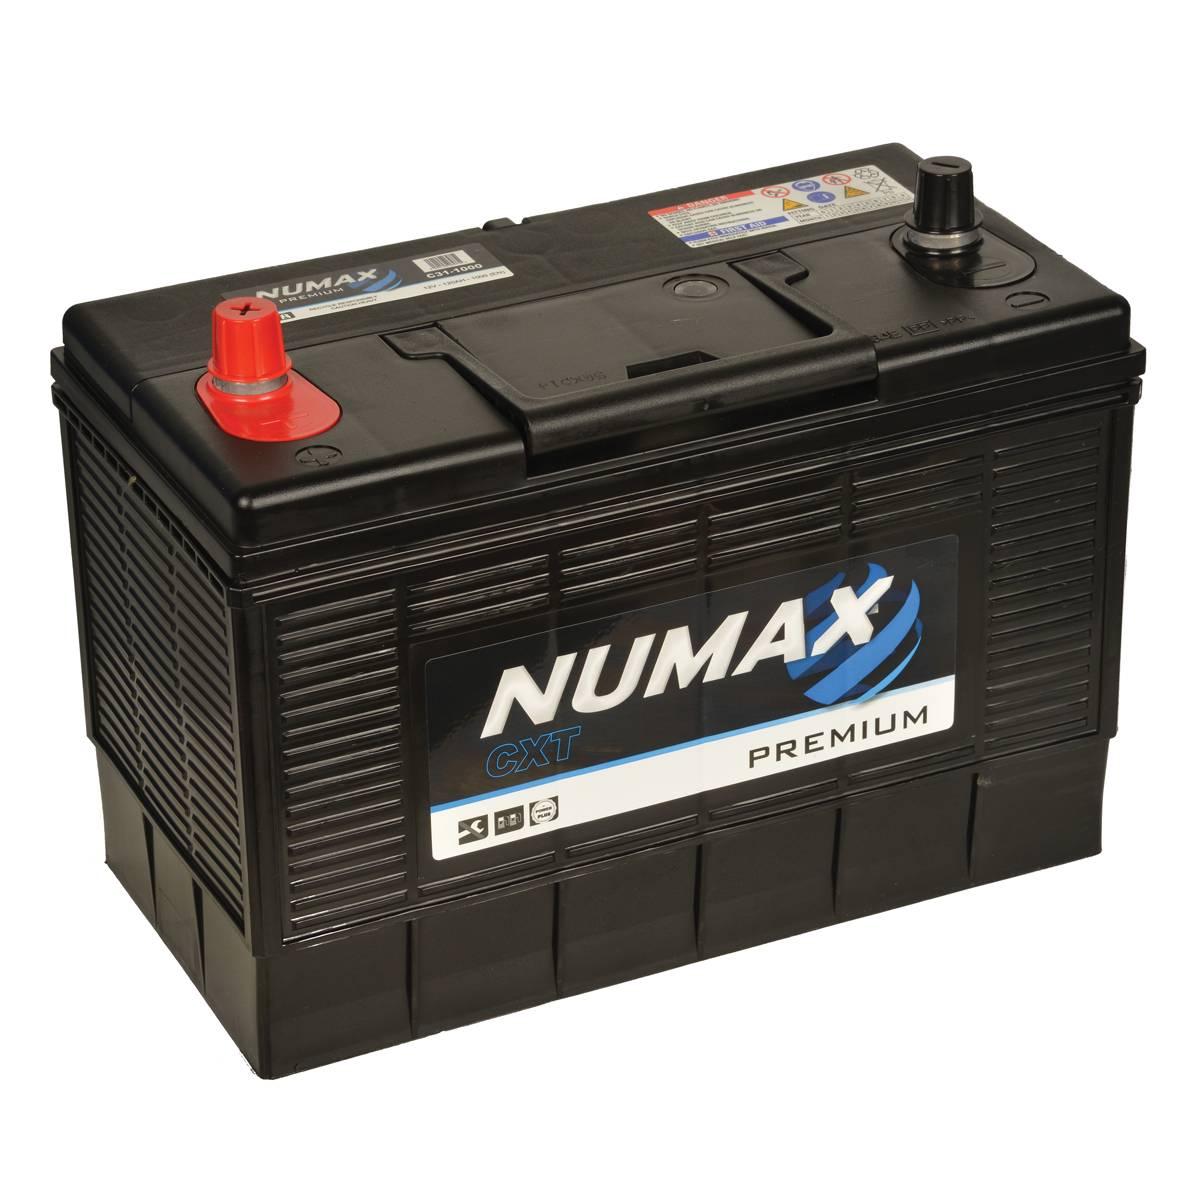 Numax Commerical Industrial C31-1000 12v 115Ah 1000CCA Battery